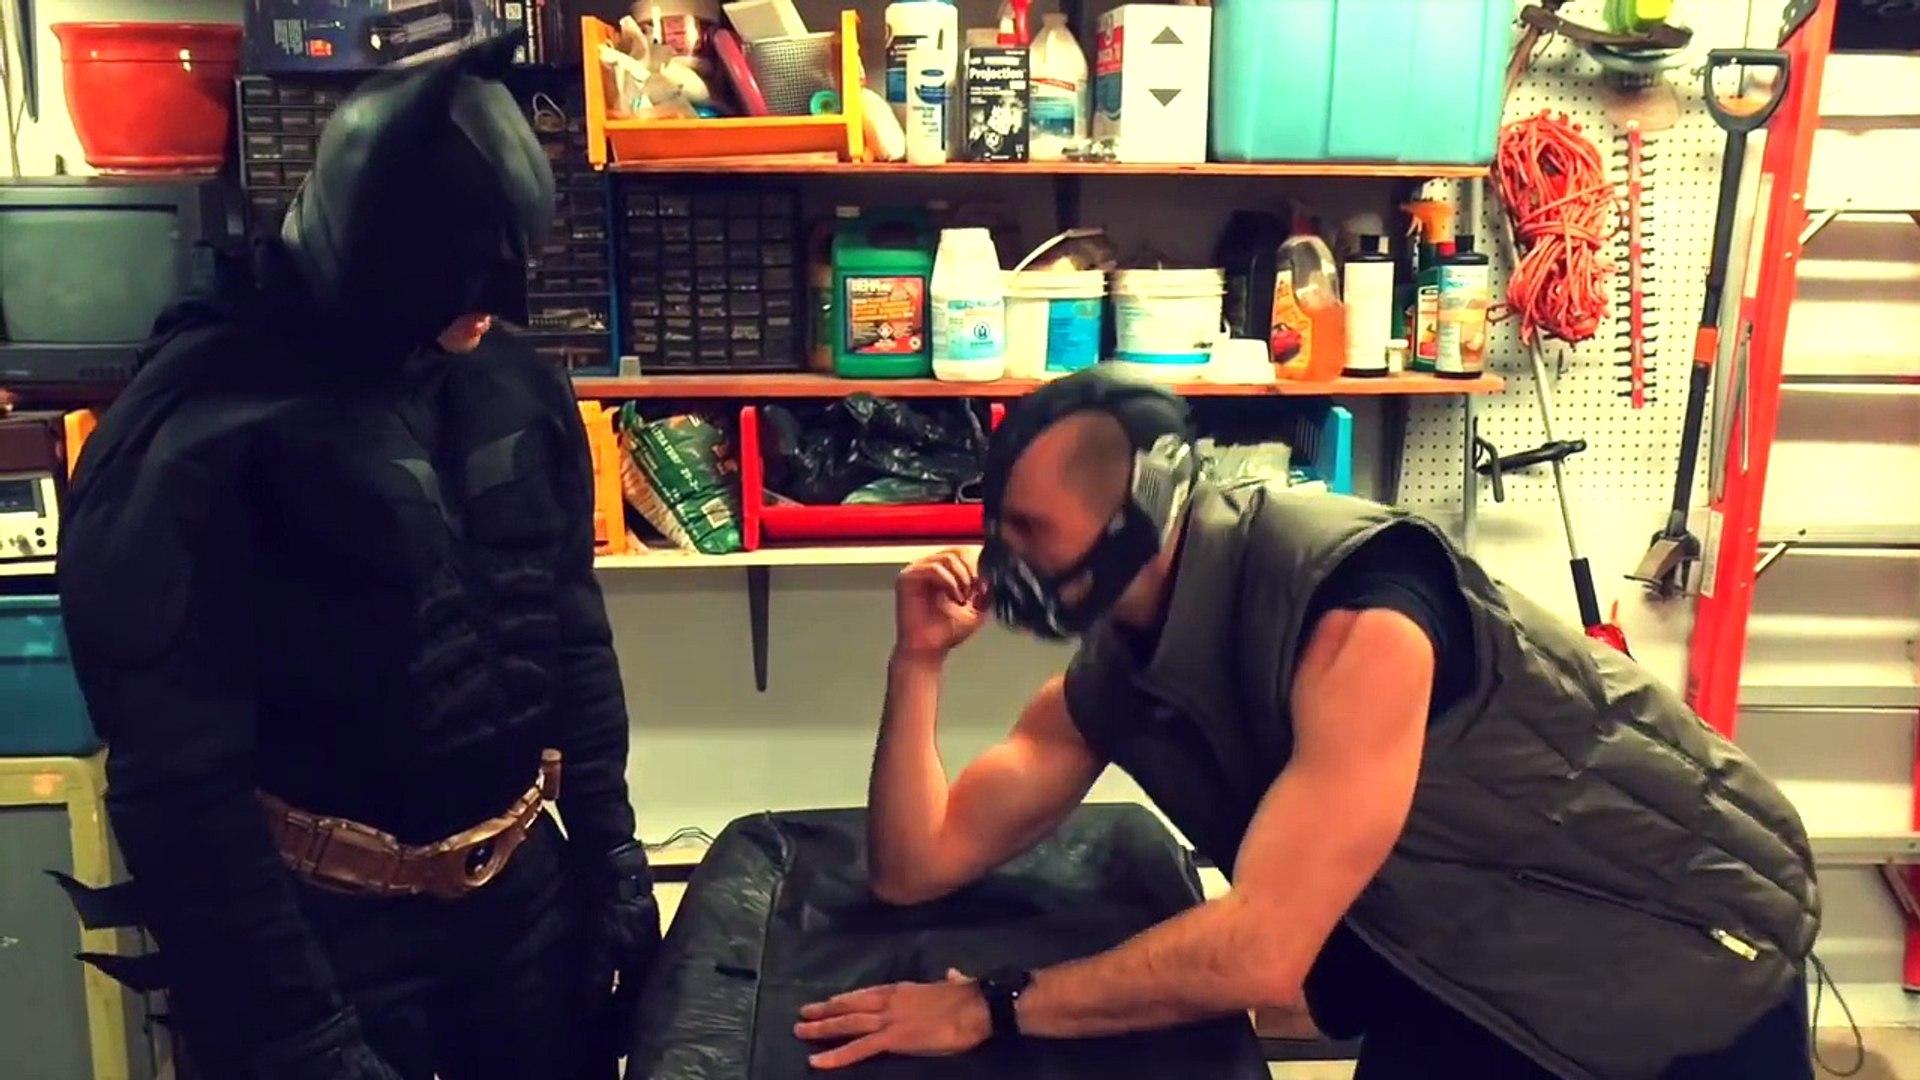 Batman Arm Wrestles - Superhero kid movie